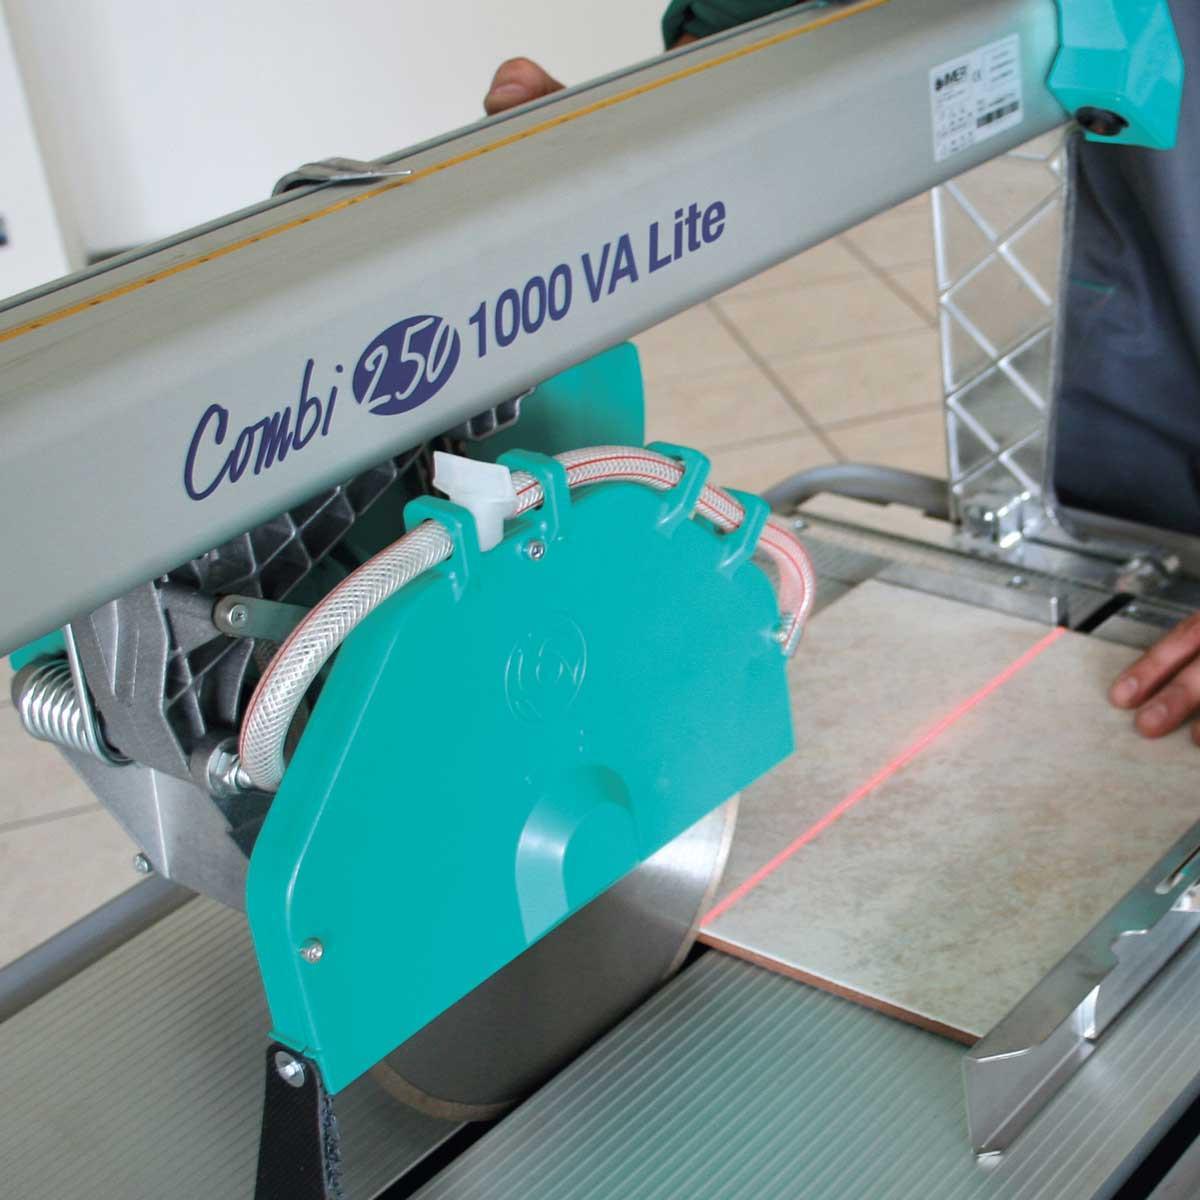 Imer Combi 250/1000VA laser cutting guide 2